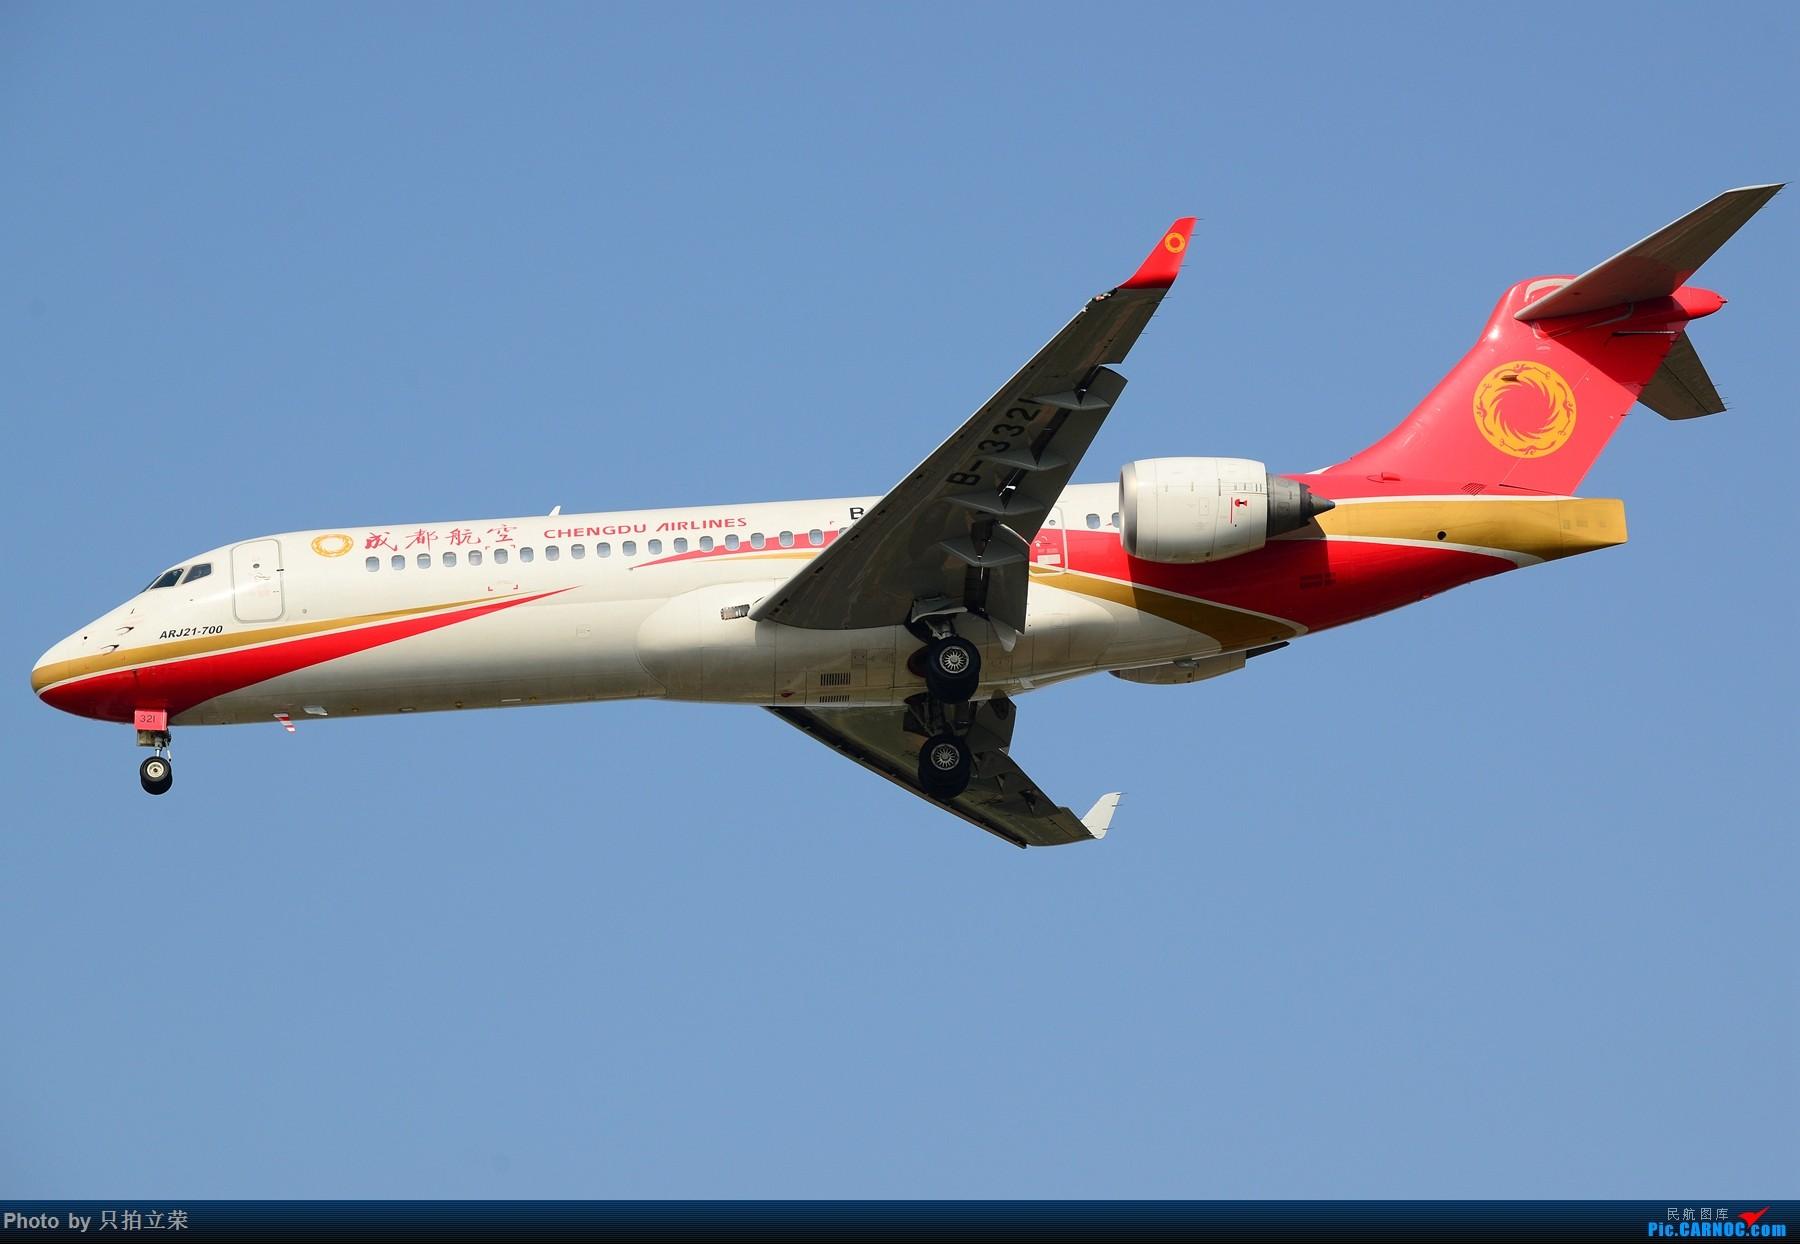 Re:[原创]湖南飞友会:黄花机场首拍飞行的青岛航空,另外还有ARJ21哦! COMAC ARJ21-700 B-3321 中国长沙黄花国际机场